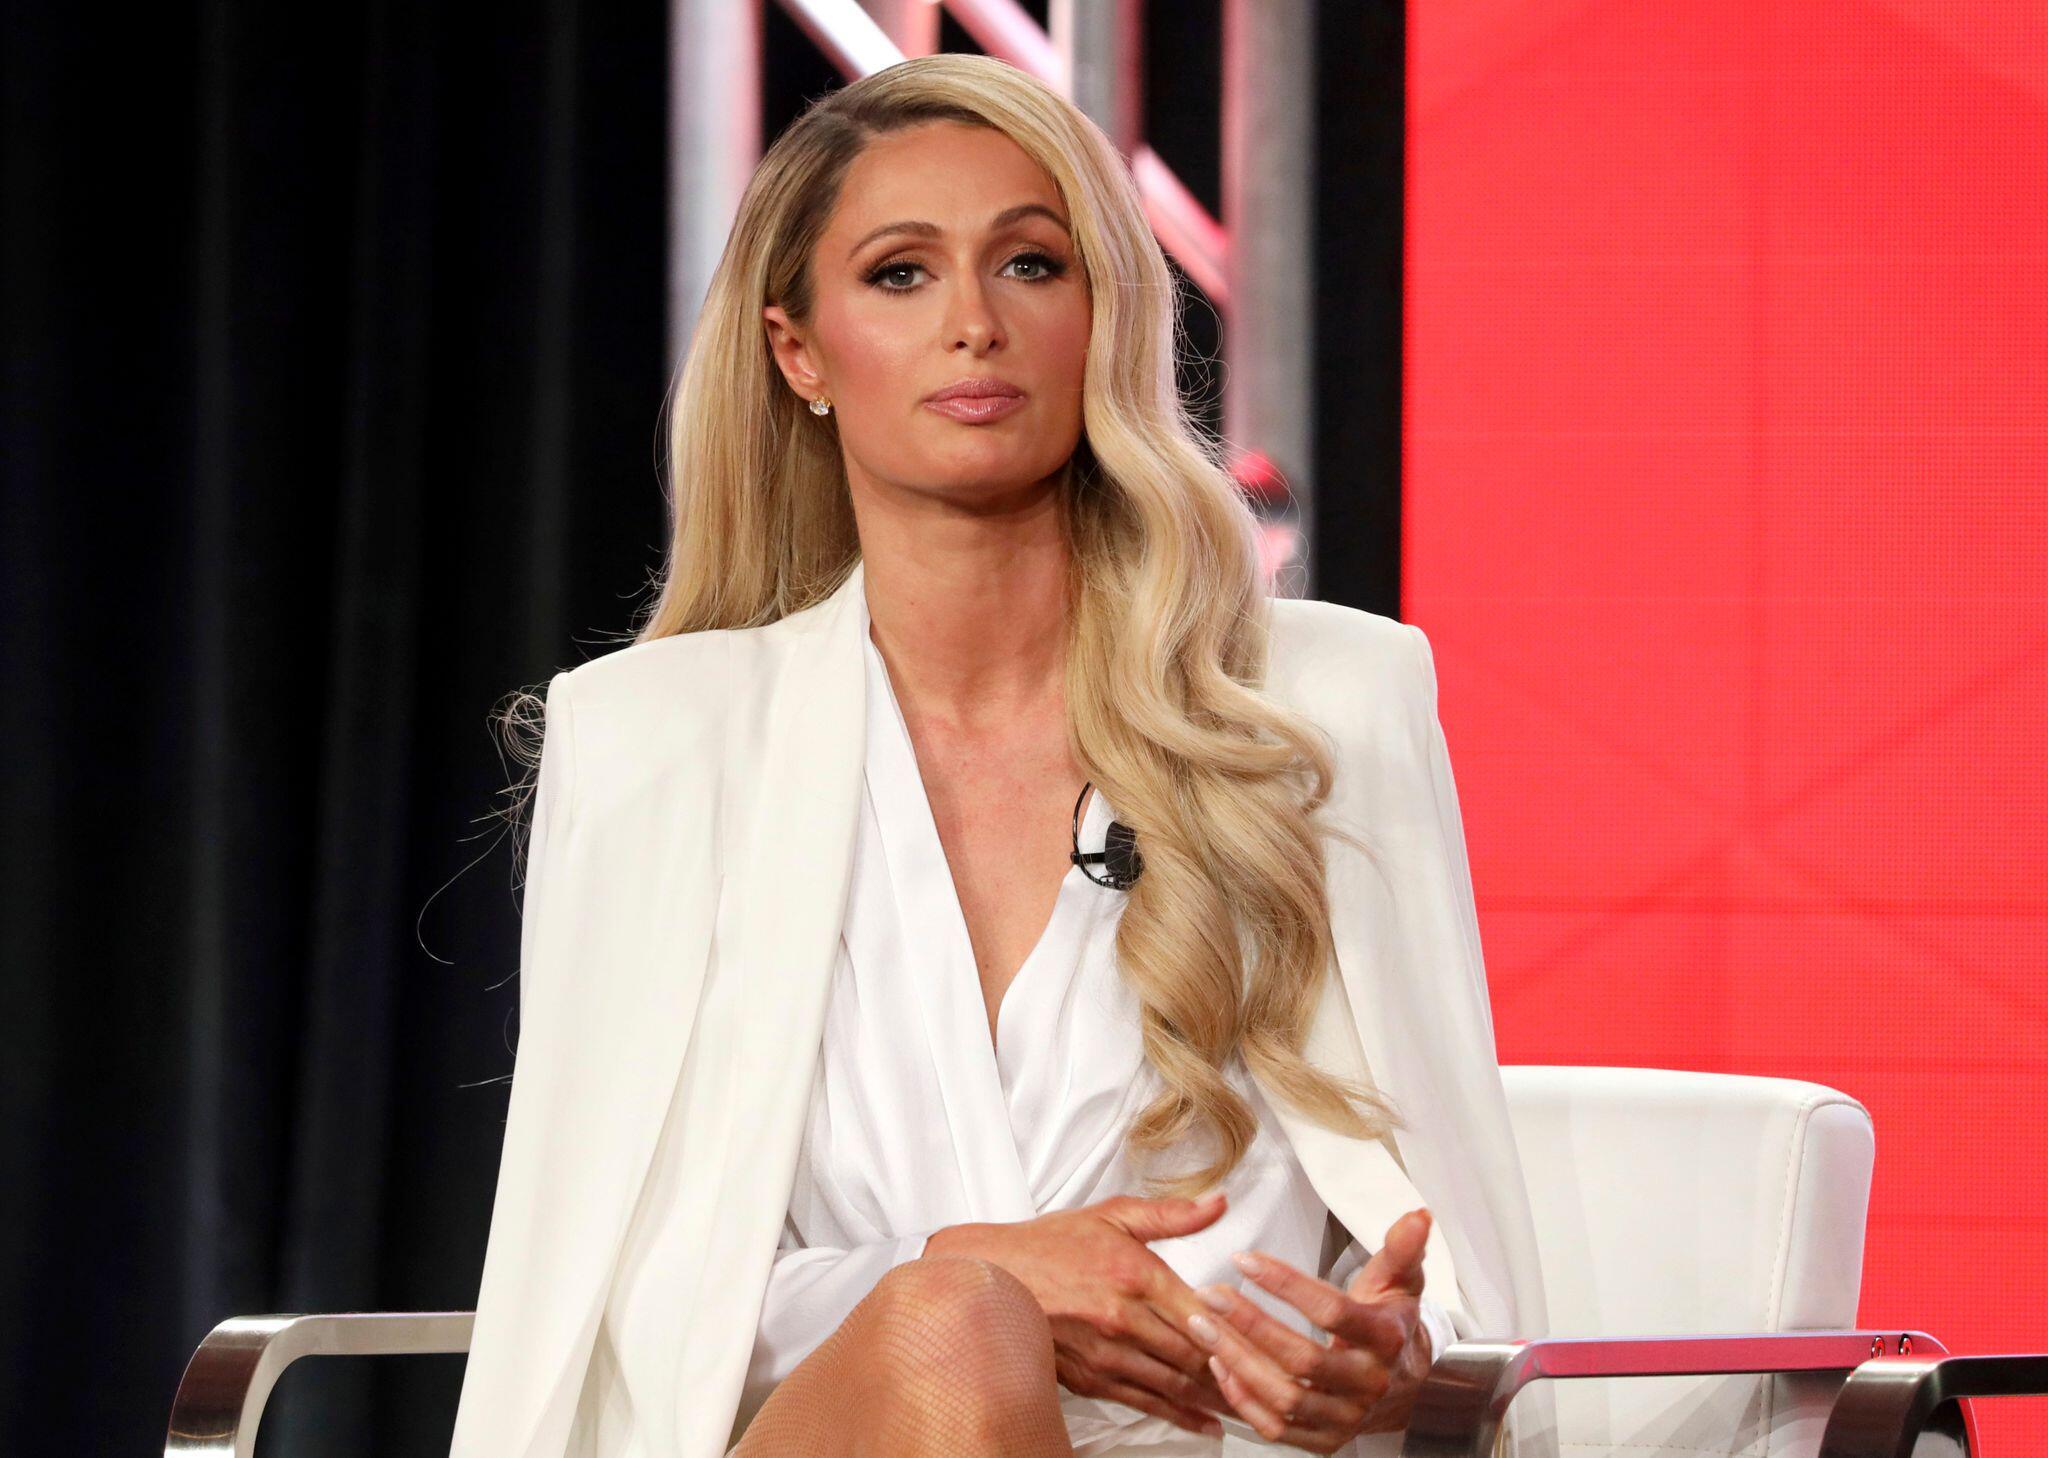 Paris Hilton: Künstliche Befruchtung wegen Zwillings-Wunsch